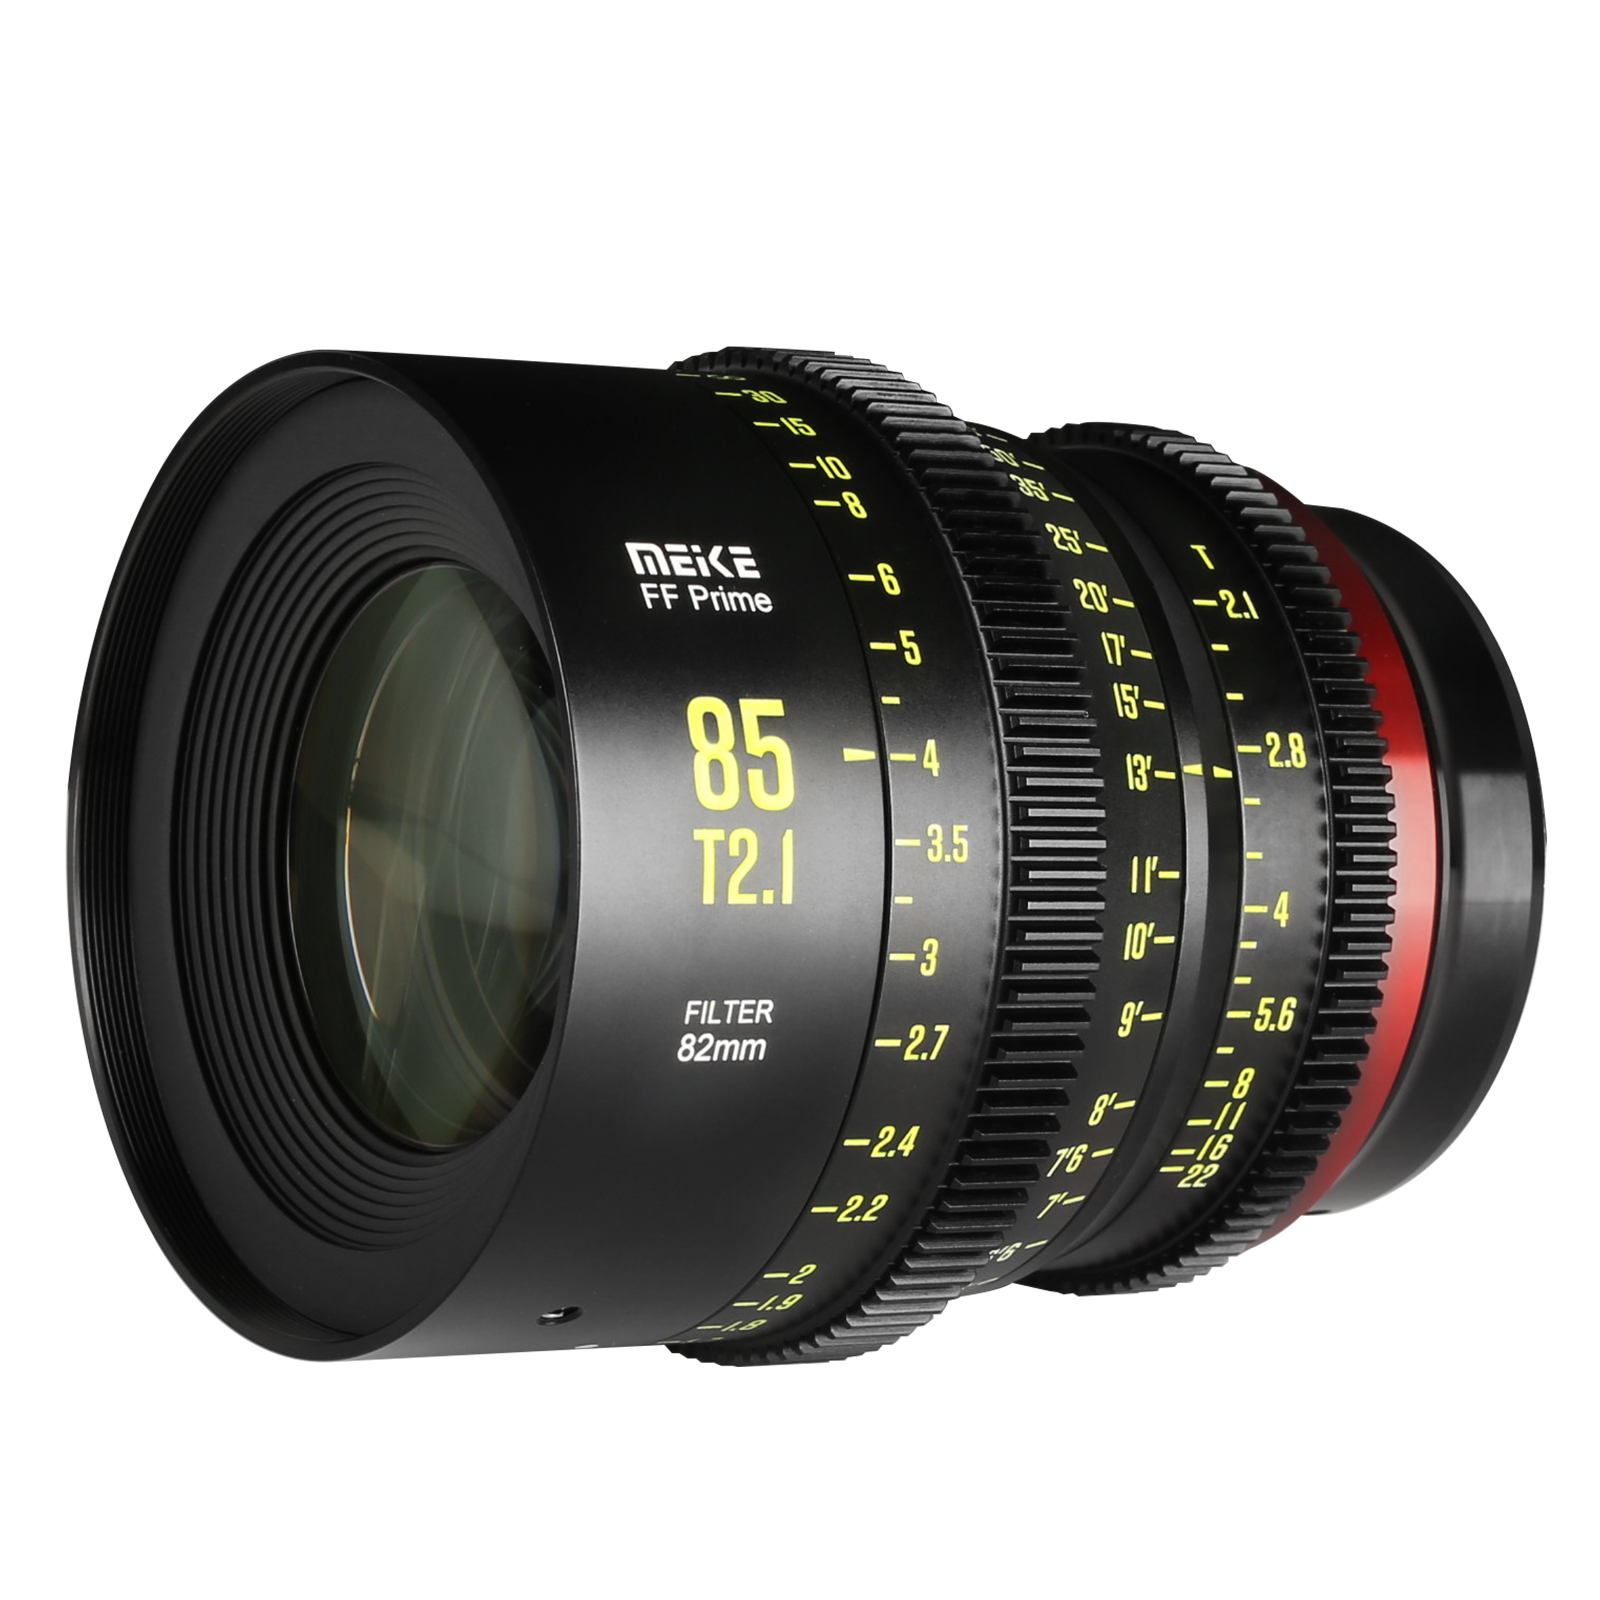 Meike Prime 85mm T2.1 Cine Lens for Full Frame Cinema Camera Systems-Fast Delivery